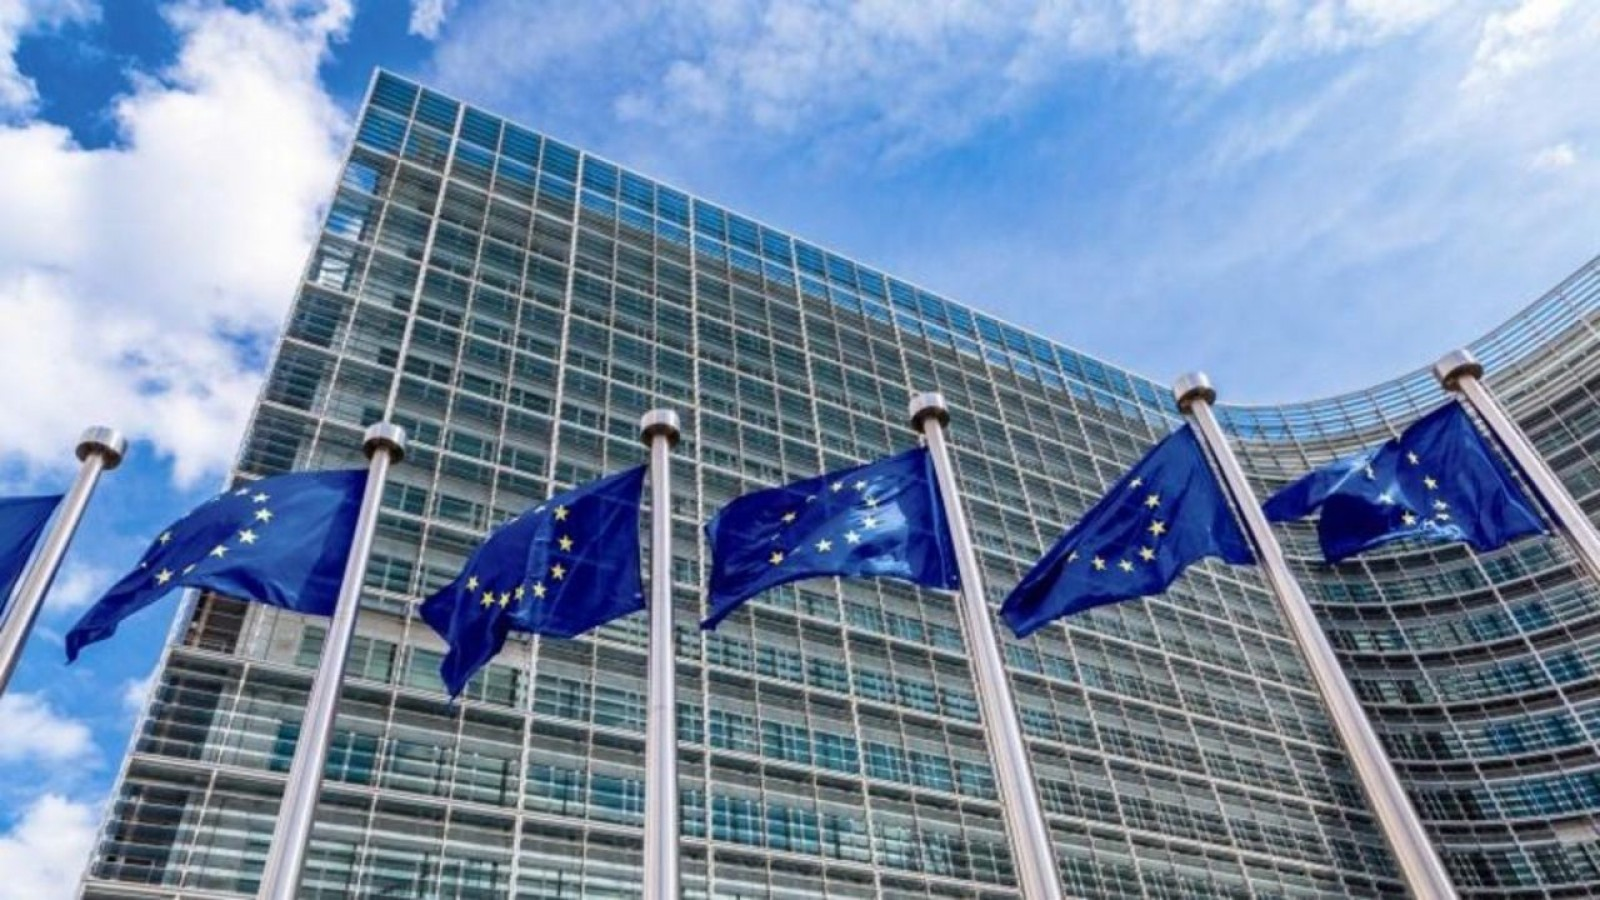 legislacion-union-europea-bicis-electricas/